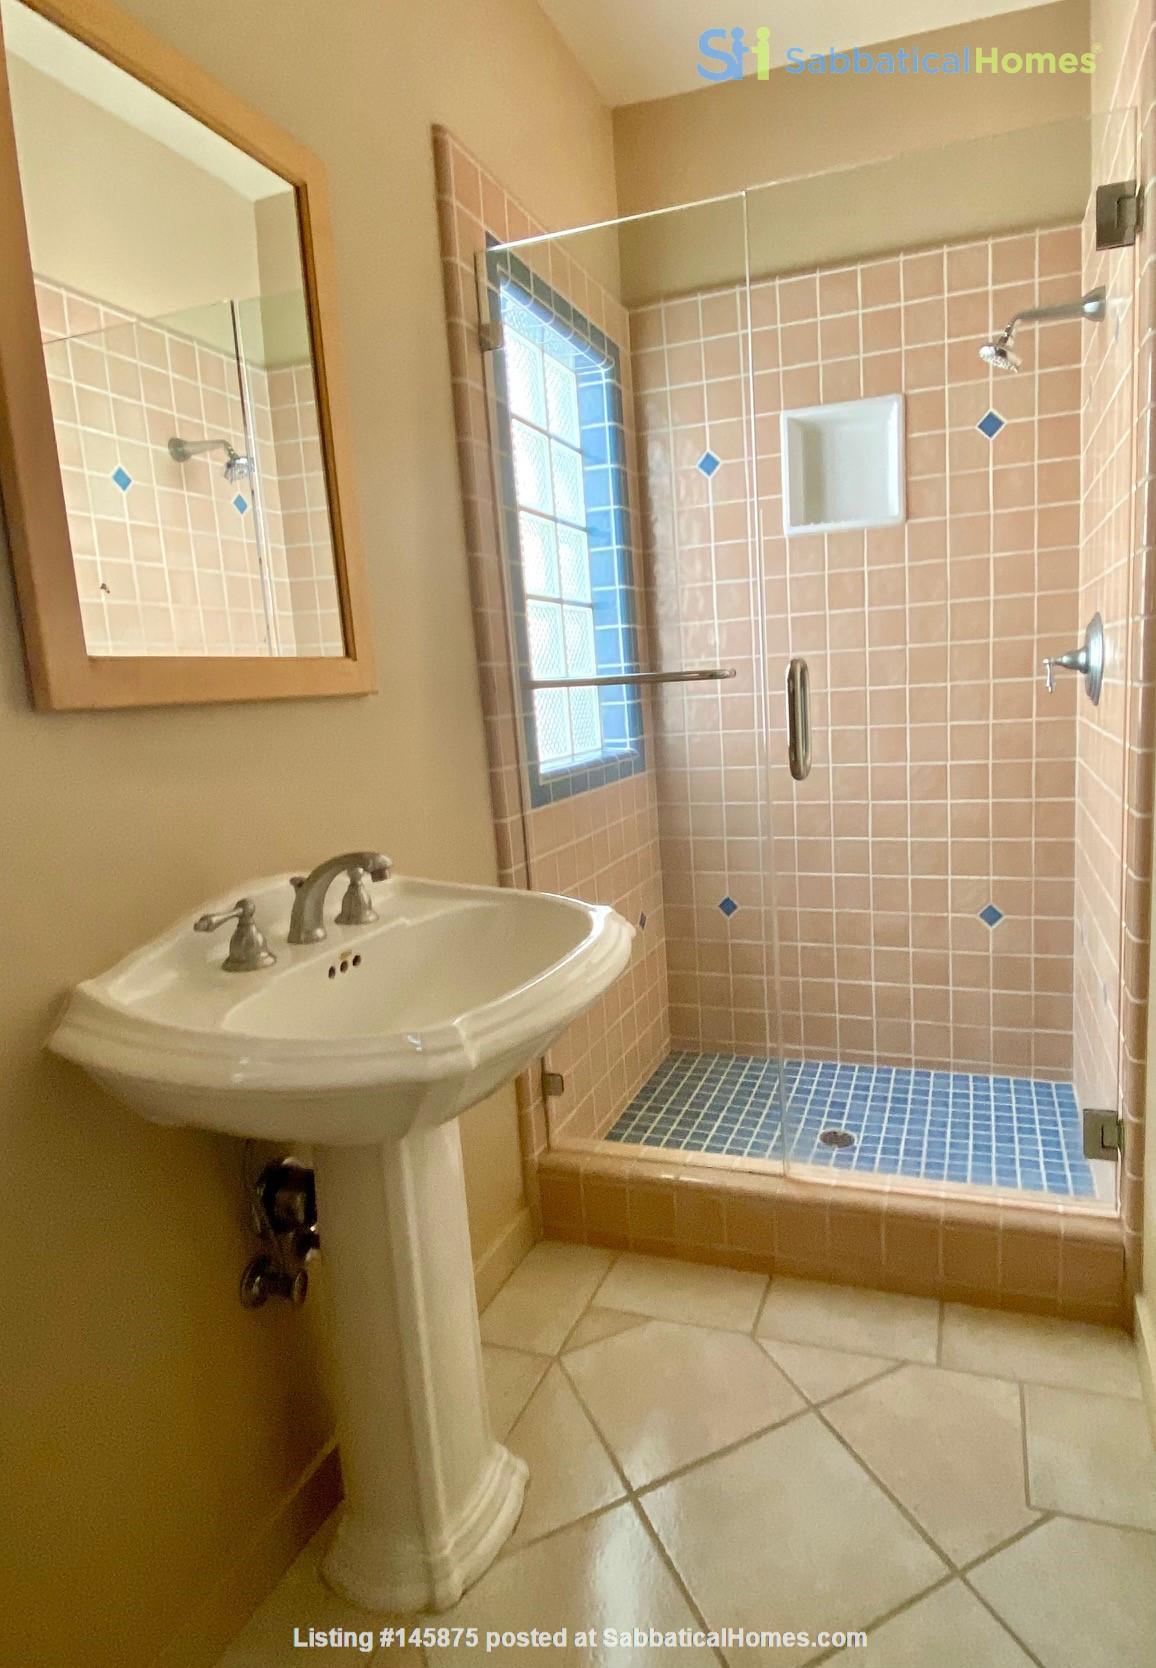 Beautiful 4 Bedroom Craftsman Home in Highly Rated Piedmont School District Home Rental in Piedmont 8